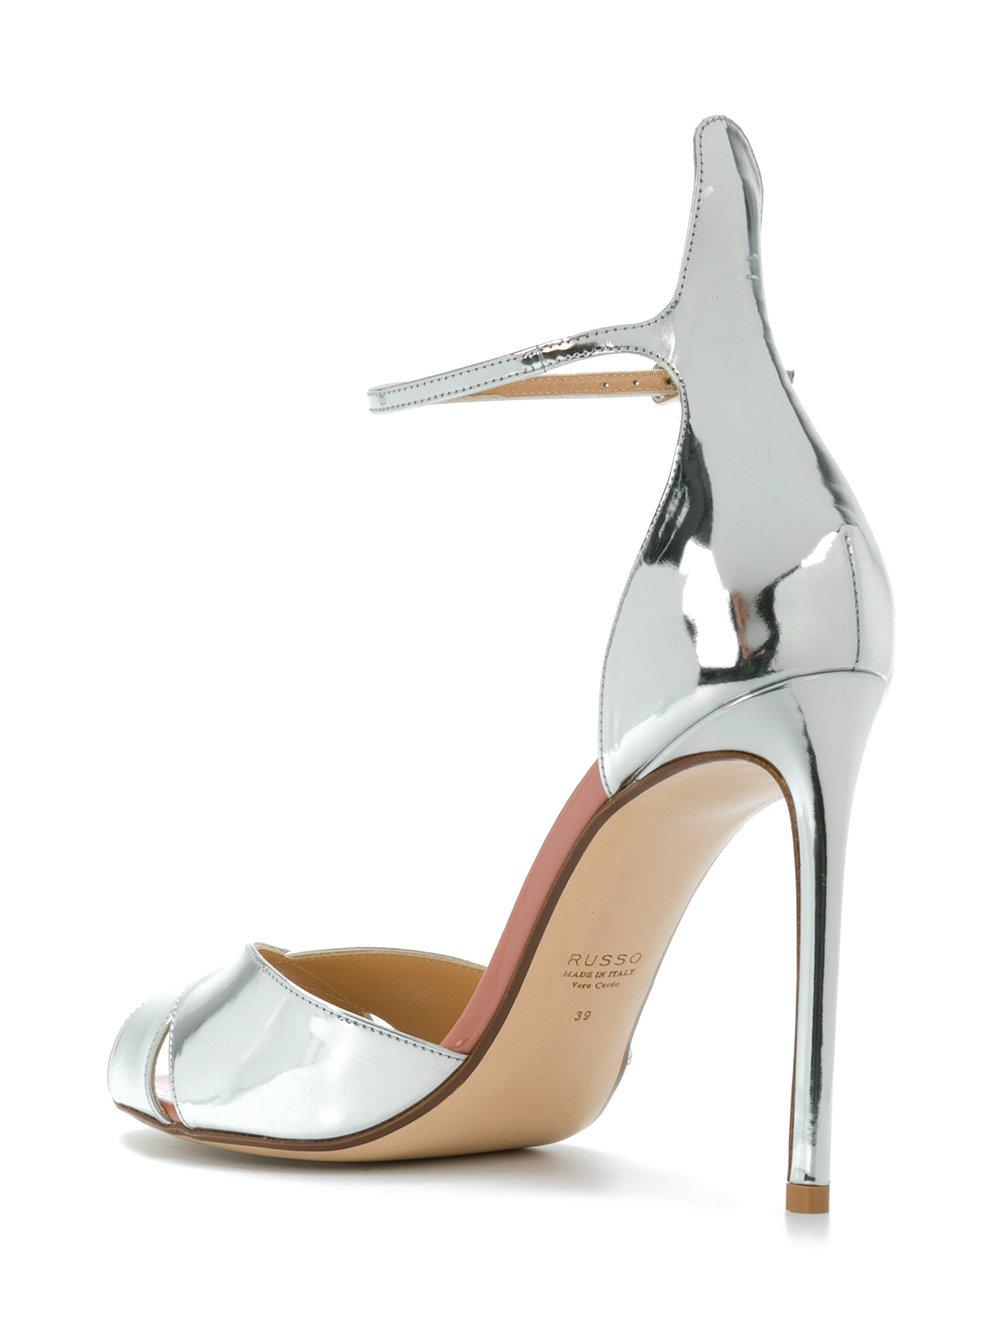 8f7ea67bae7 Francesco Russo - Metallic Slingback Mirror Sandals - Lyst. View fullscreen